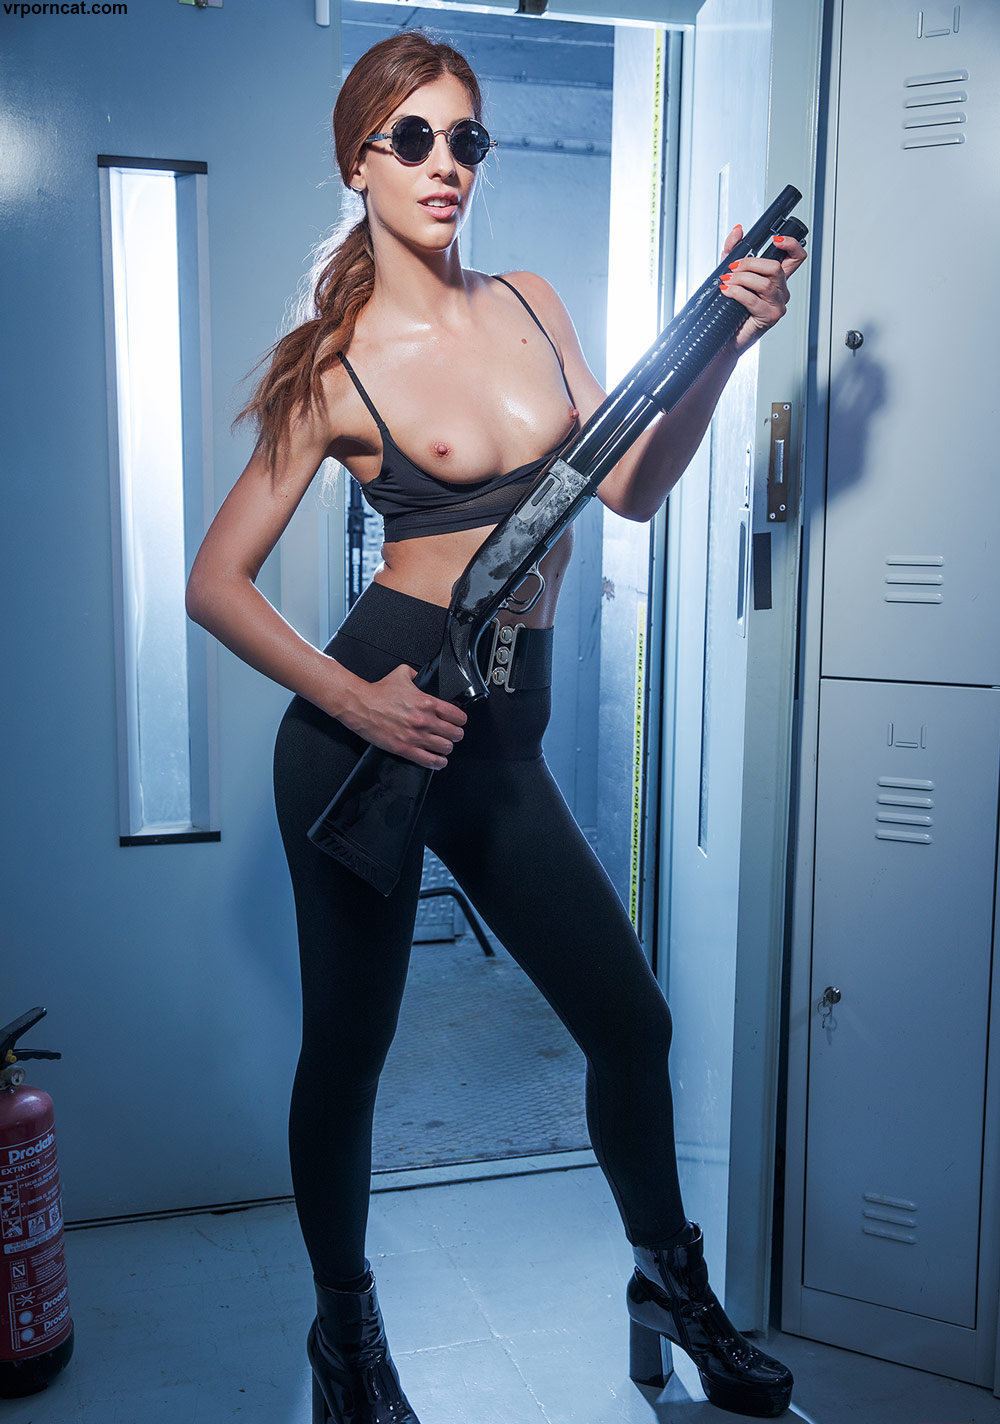 Sarah Connor, Terminator By Shona River